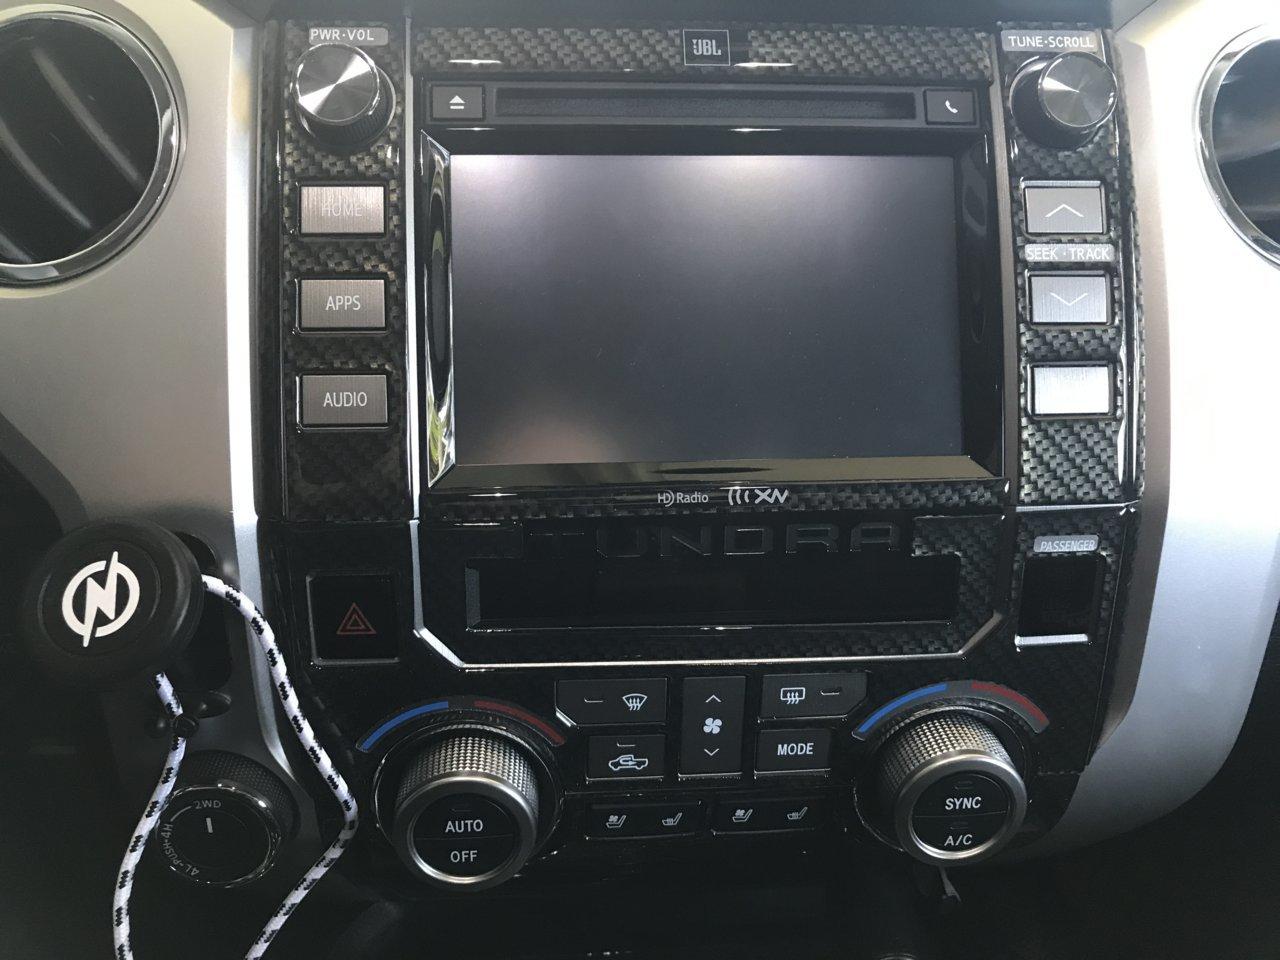 B0E34228-EF10-46CC-B51B-04D783755510.jpg